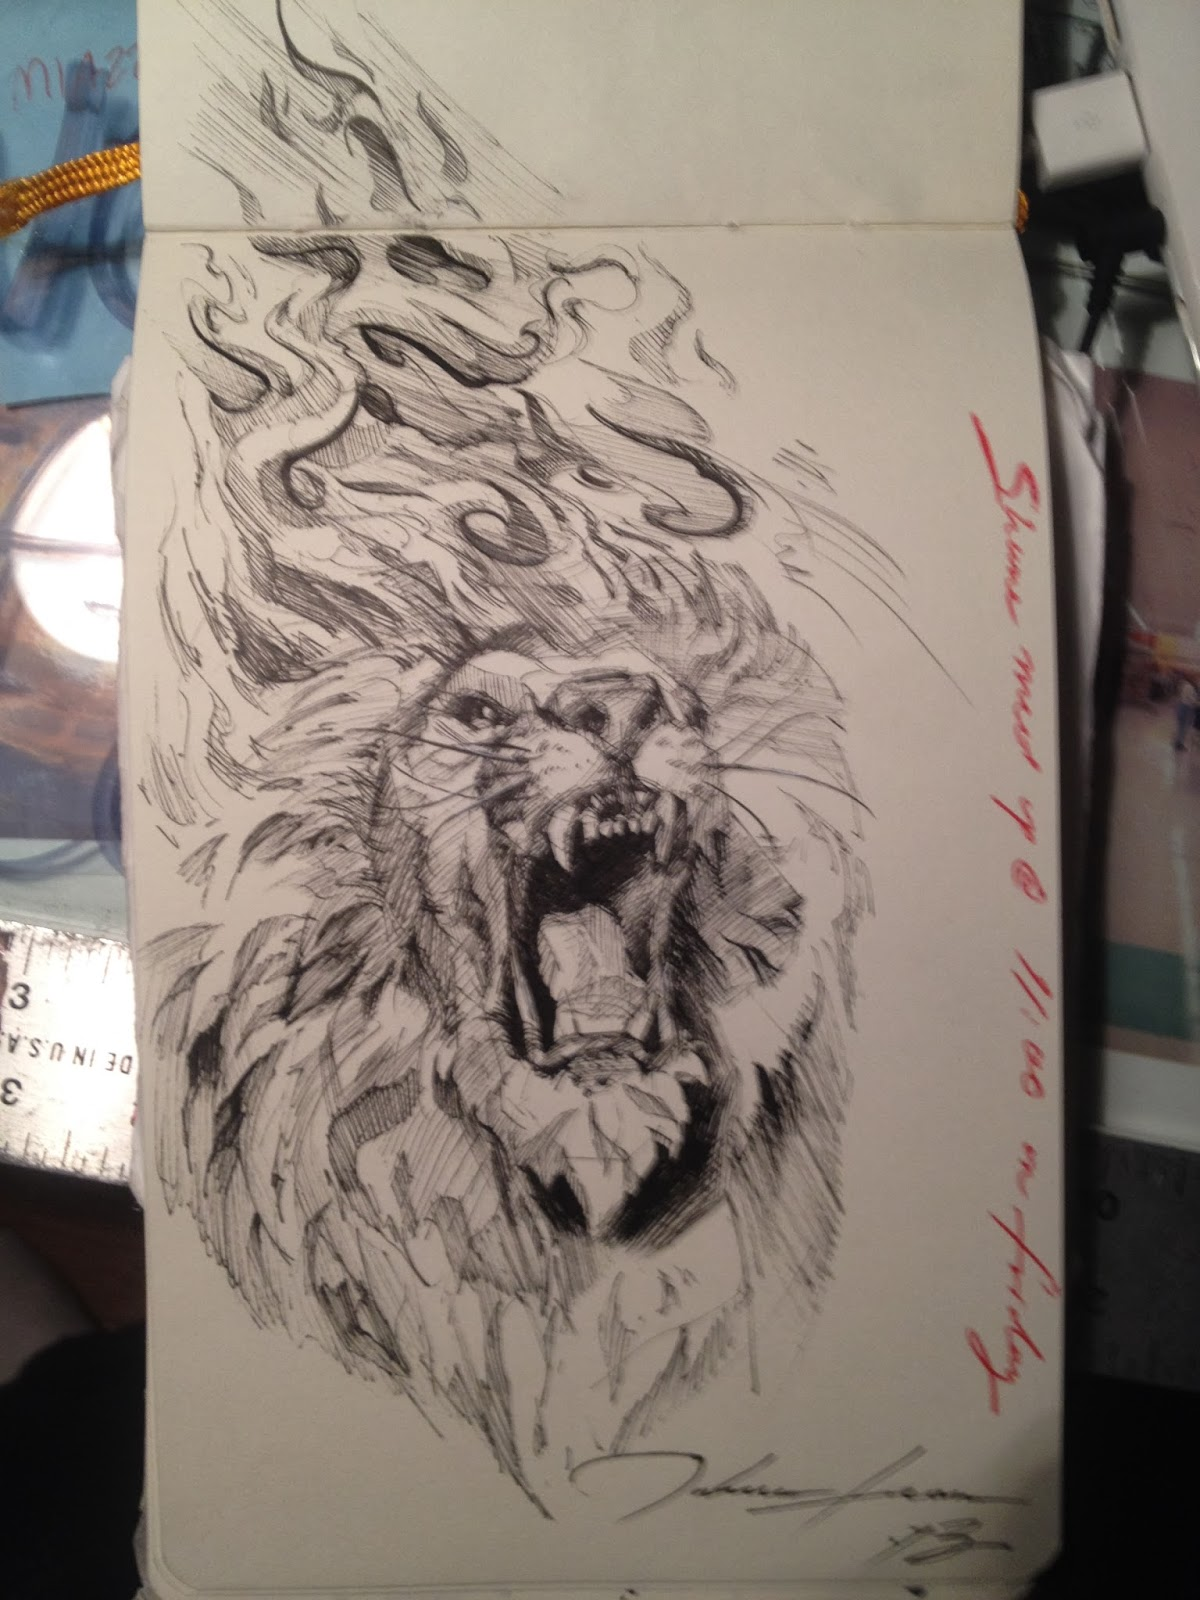 The gallery for joshua 19 lion tattoo for Joshua 1 9 tattoo